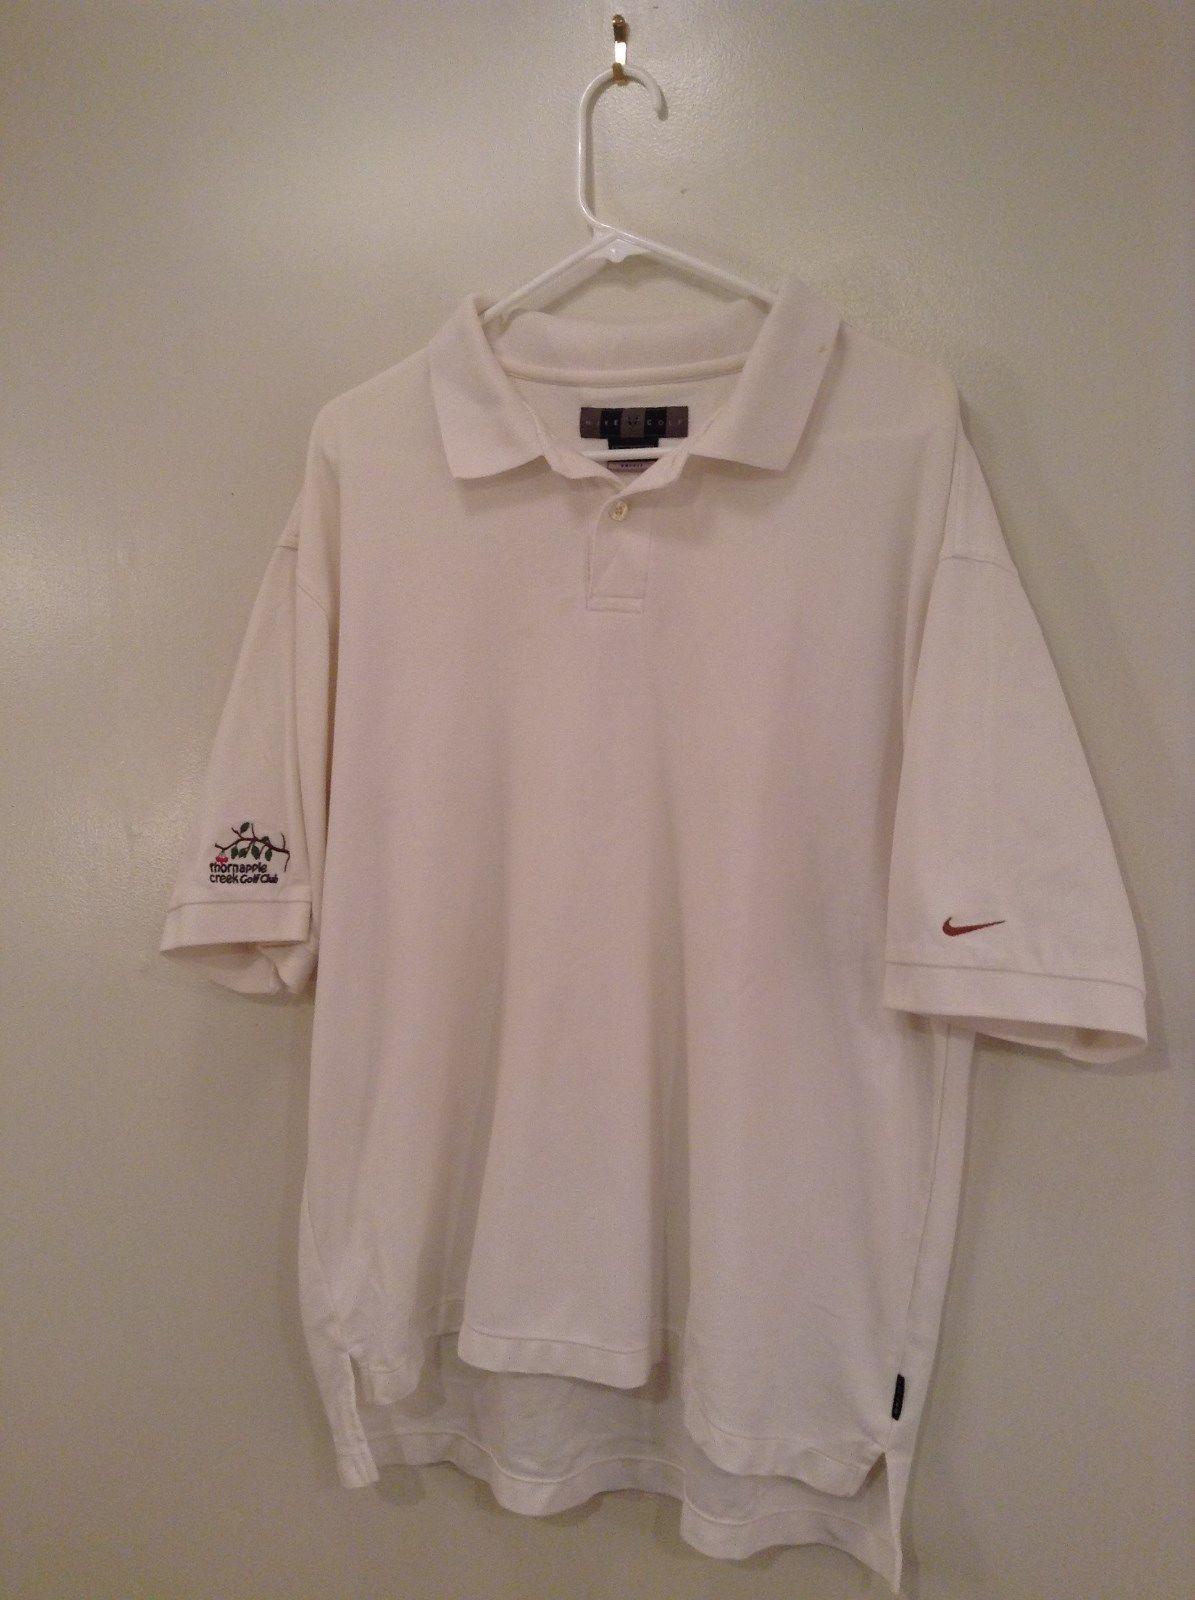 White Nike Golf Polo Shirt Embroidered Thornapple Creek Golf Club Size XL